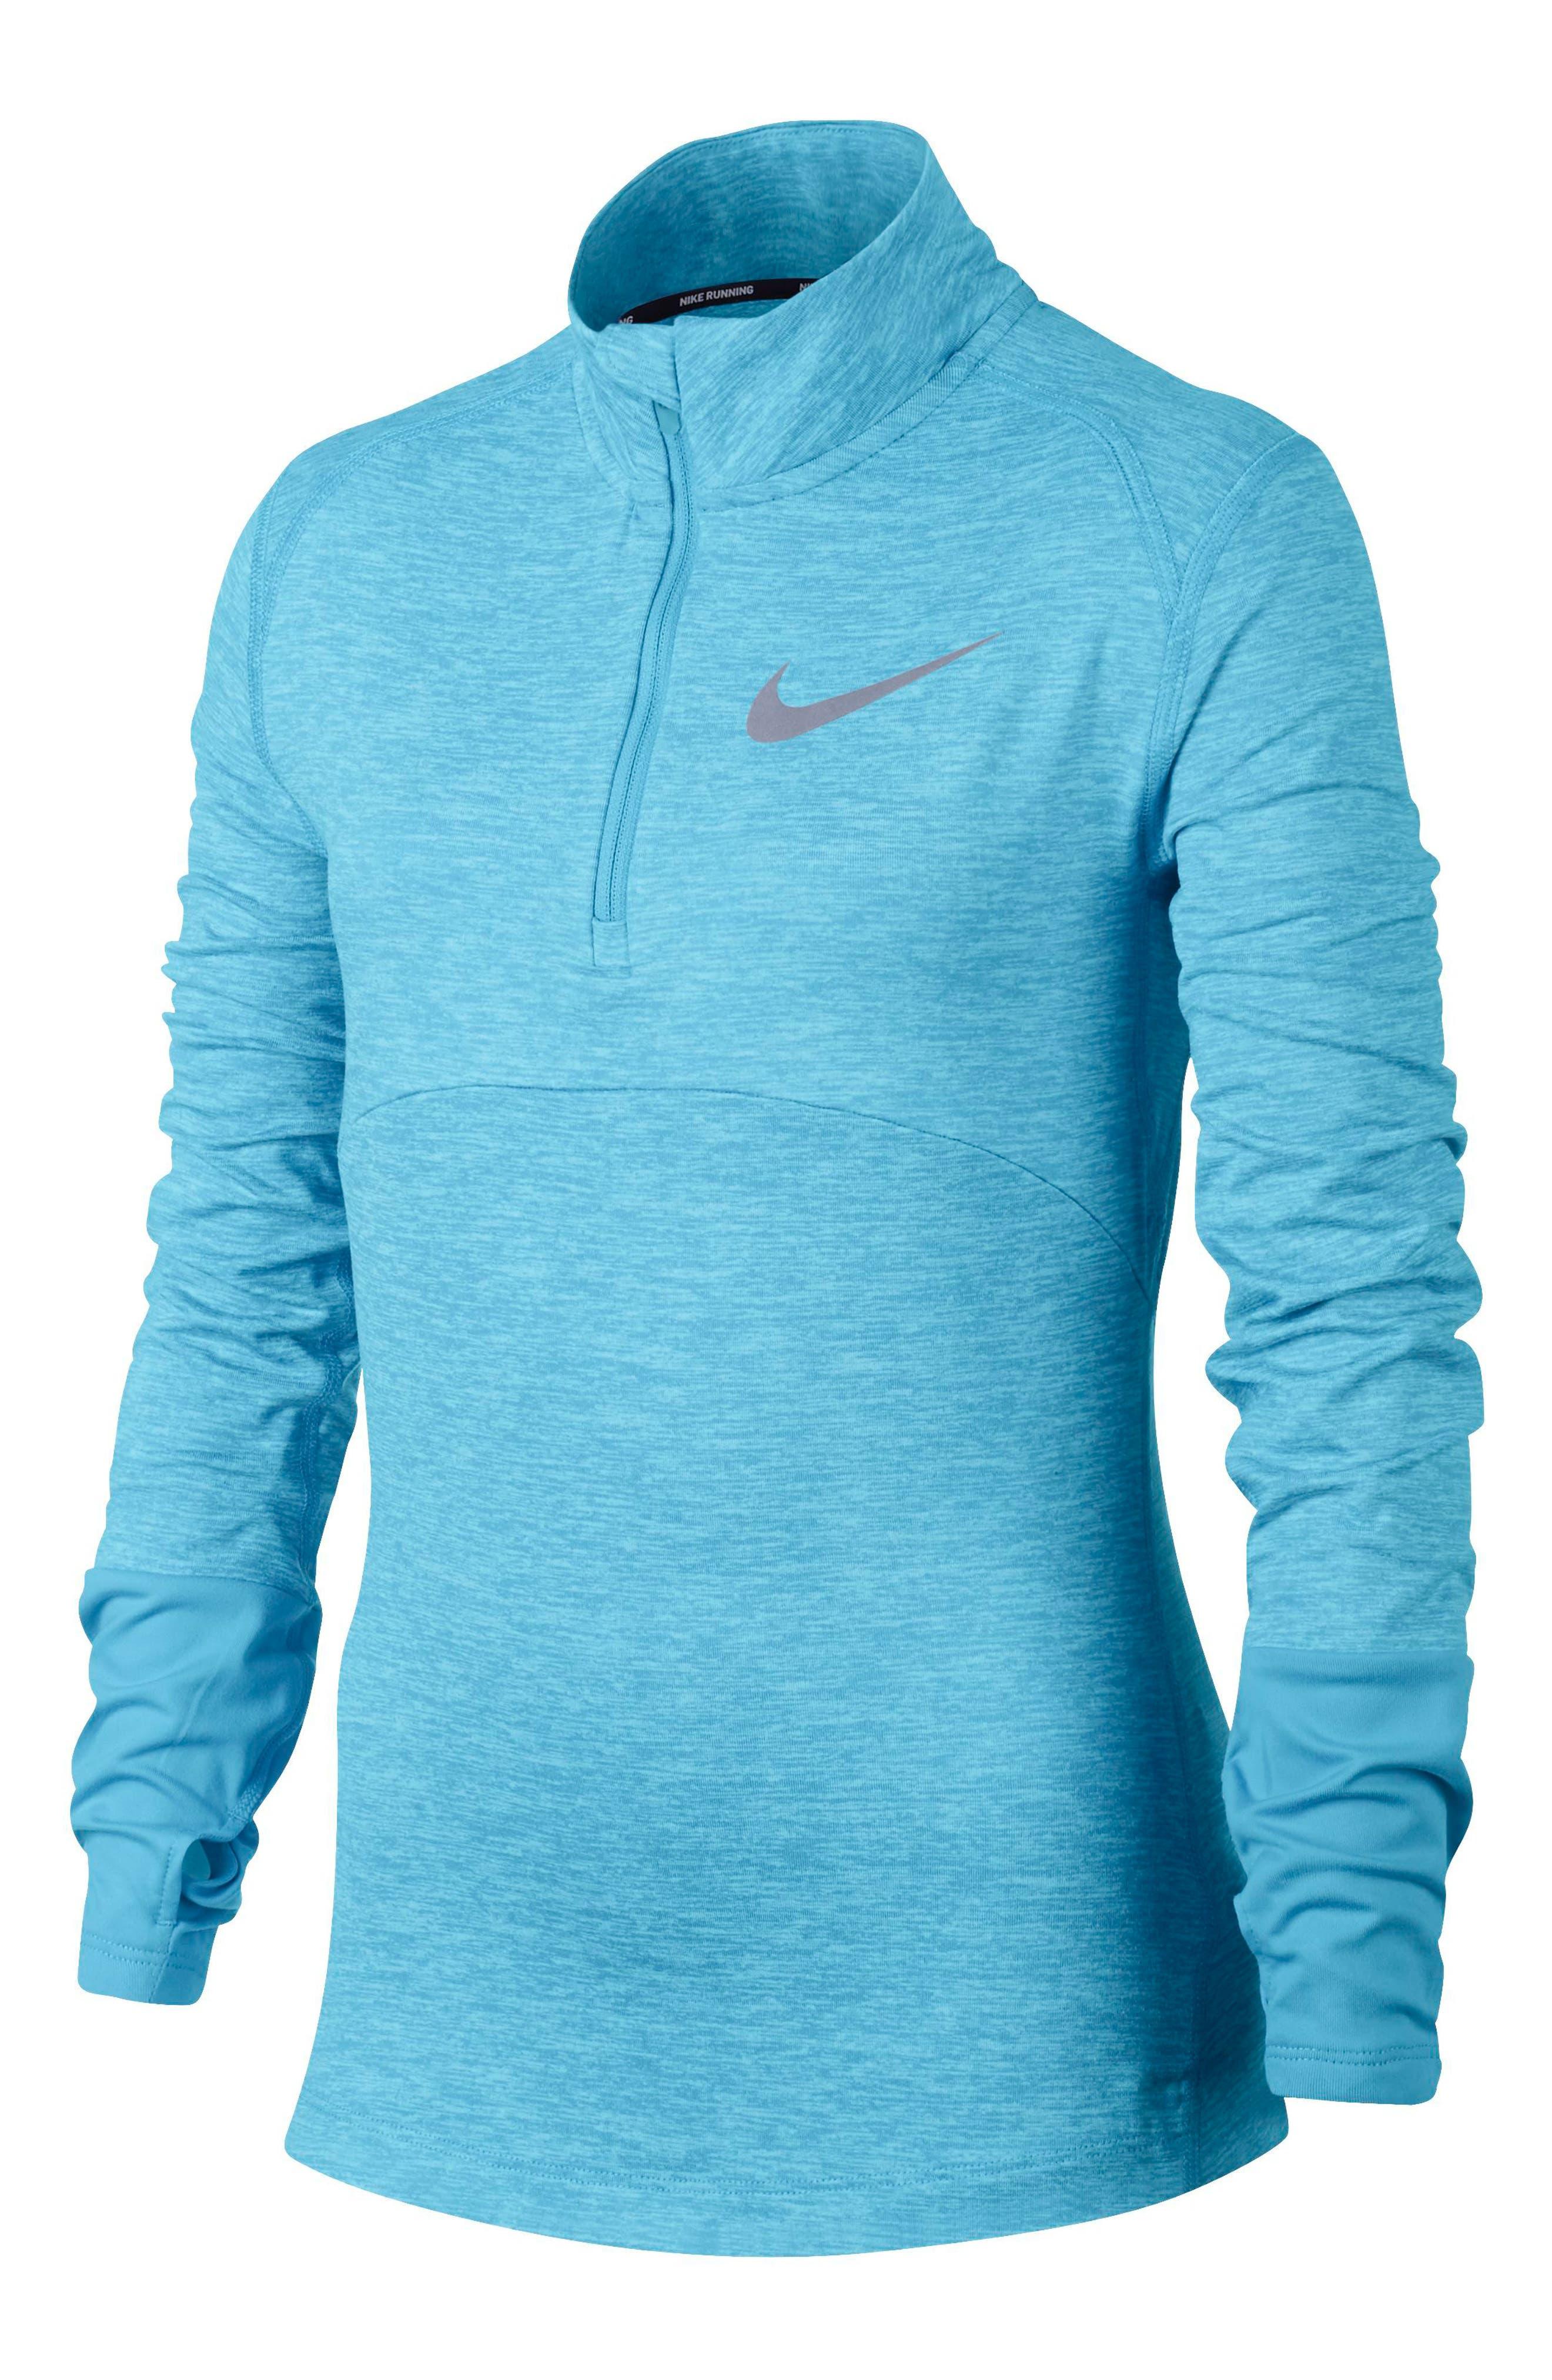 Main Image - Nike Dry Element Running Top (Big Girls)